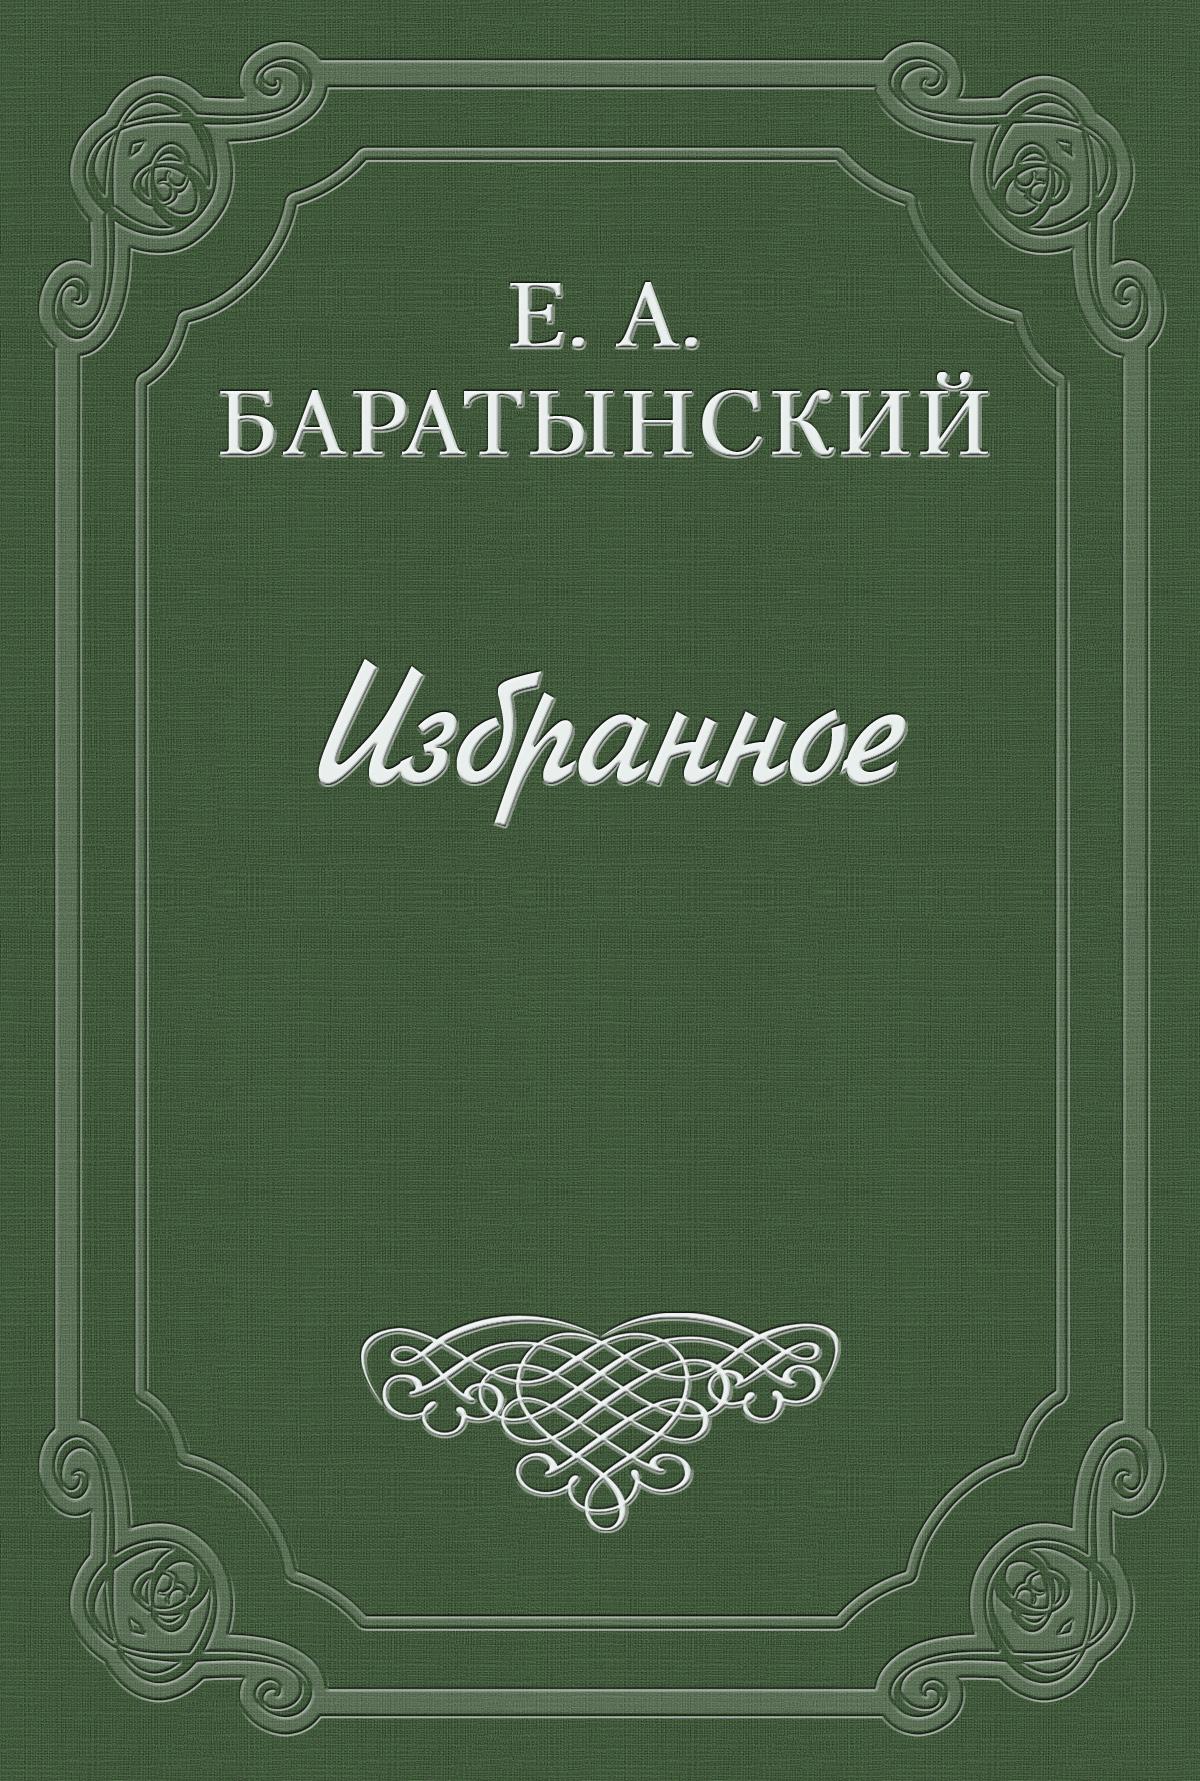 Евгений Абрамович Баратынский «Таврида» А.Муравьева евгений абрамович баратынский стихотворения